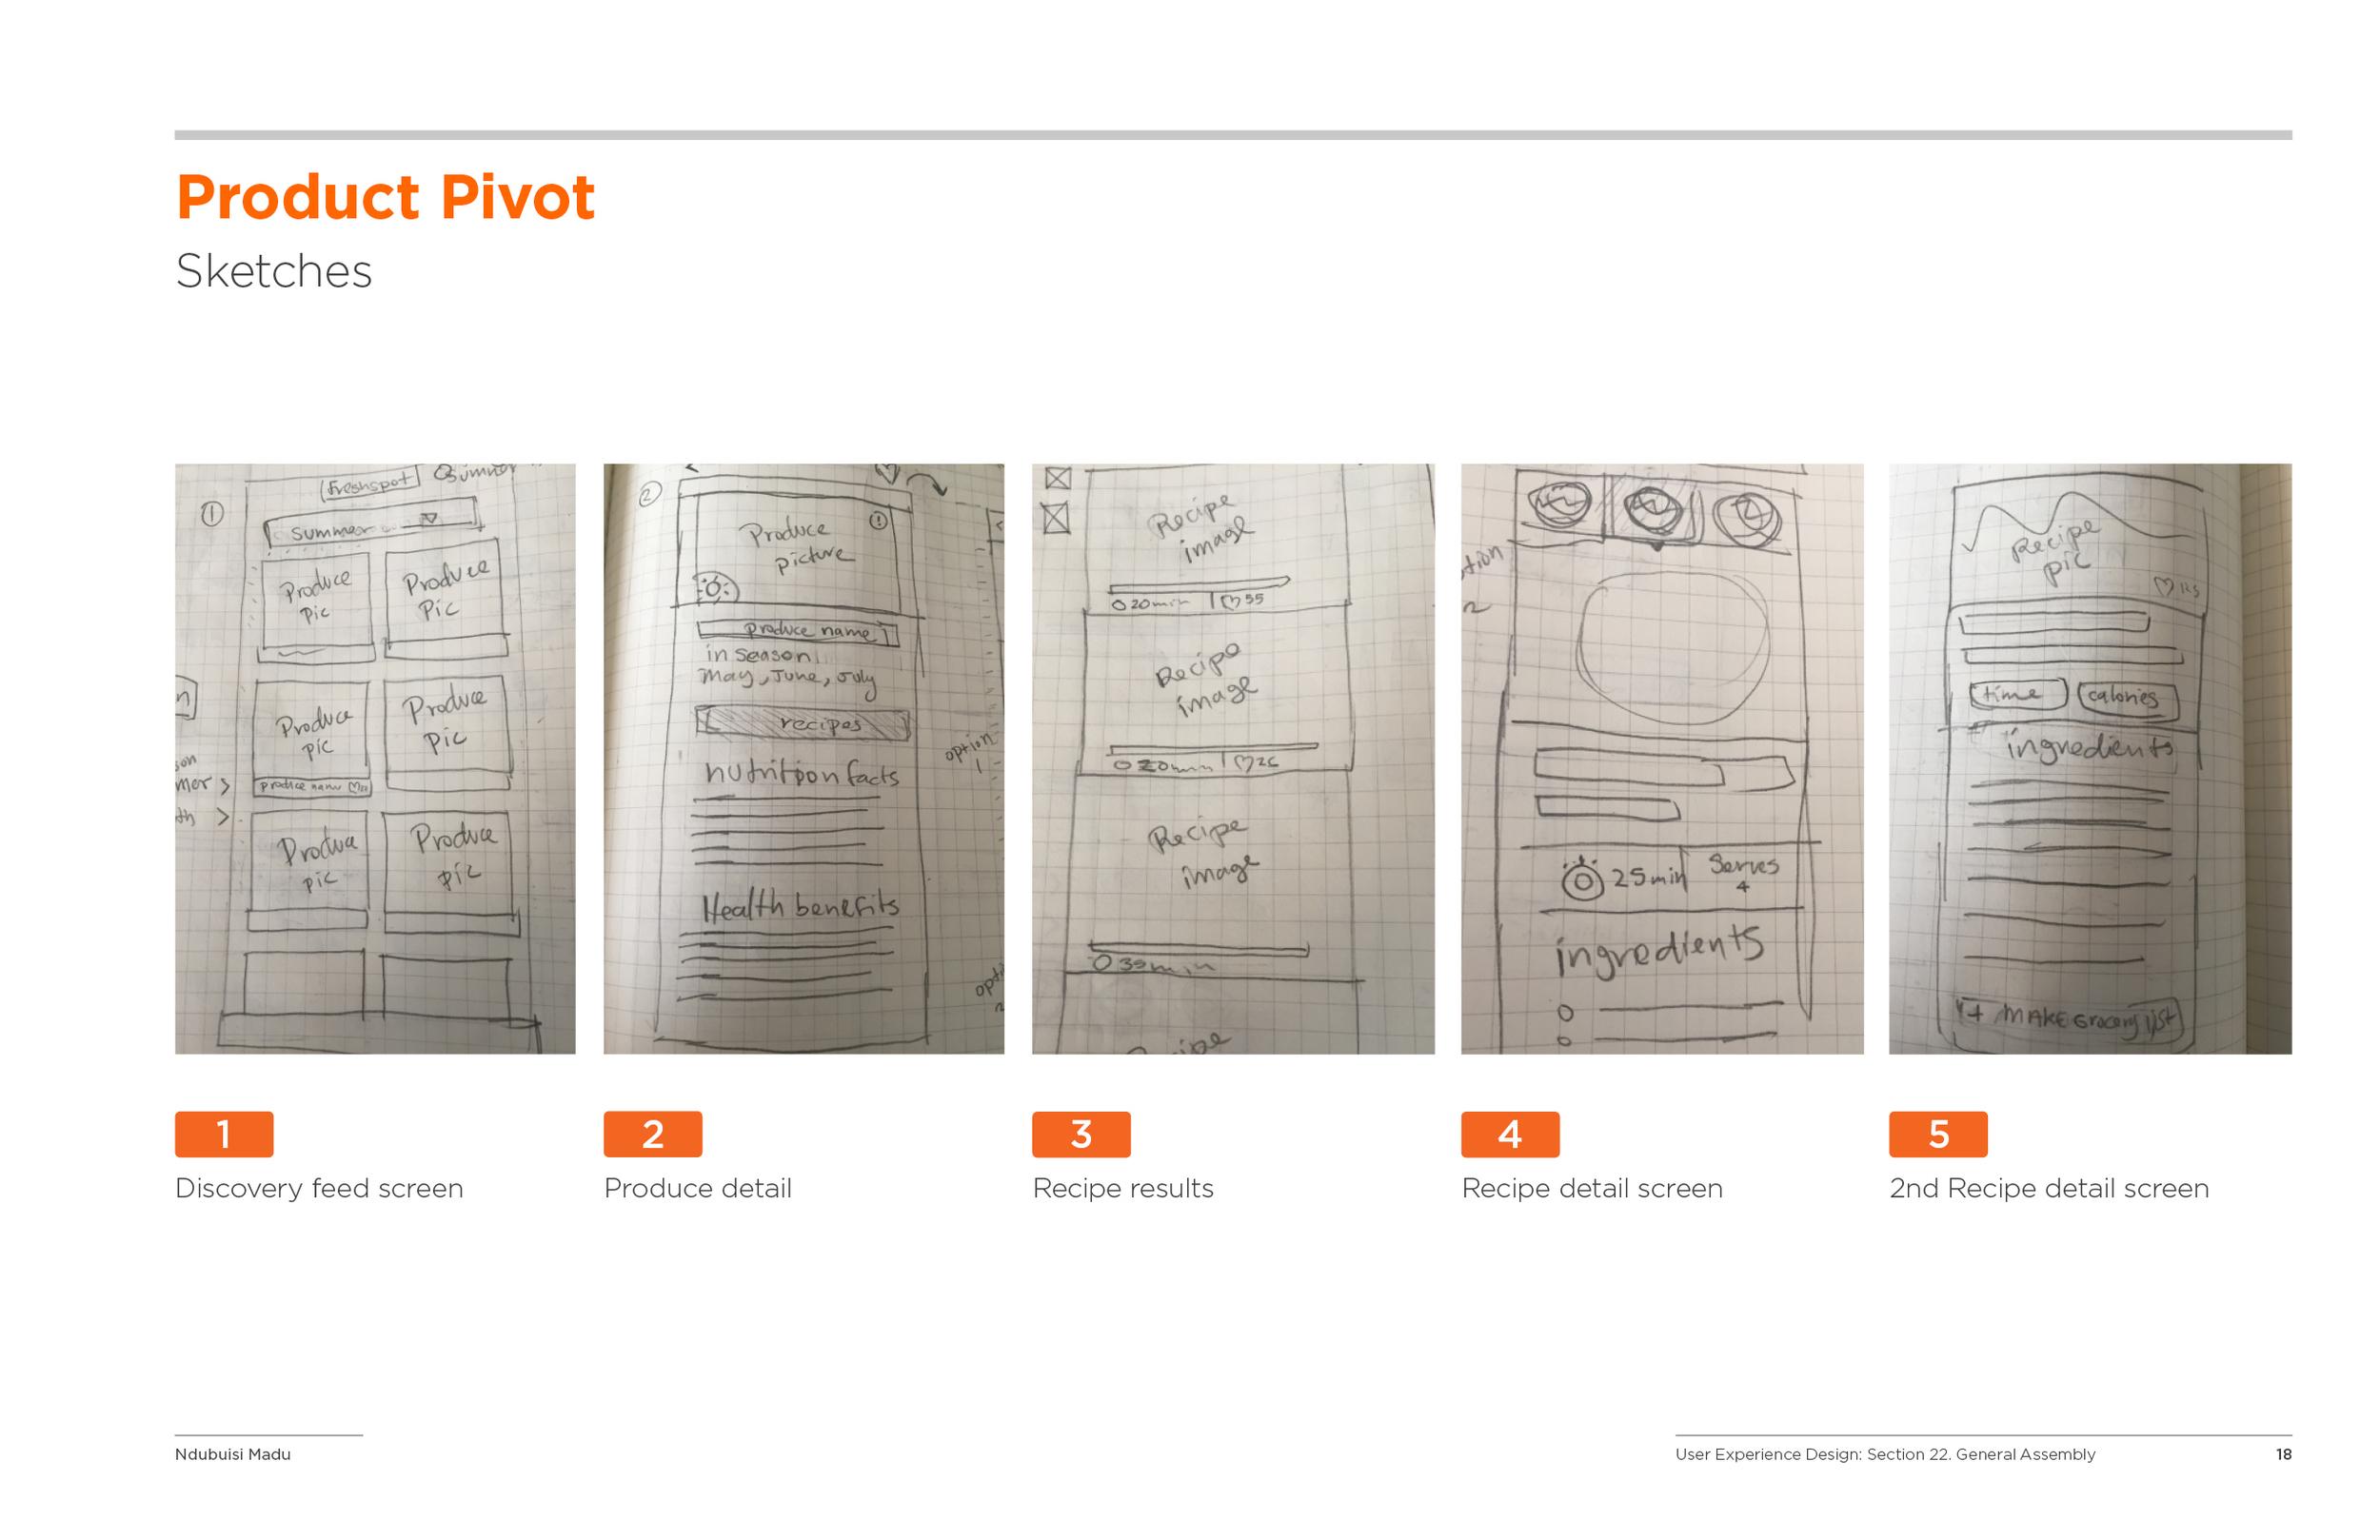 UXD22_NduMadu_Final_Presentation_Splash18.jpg